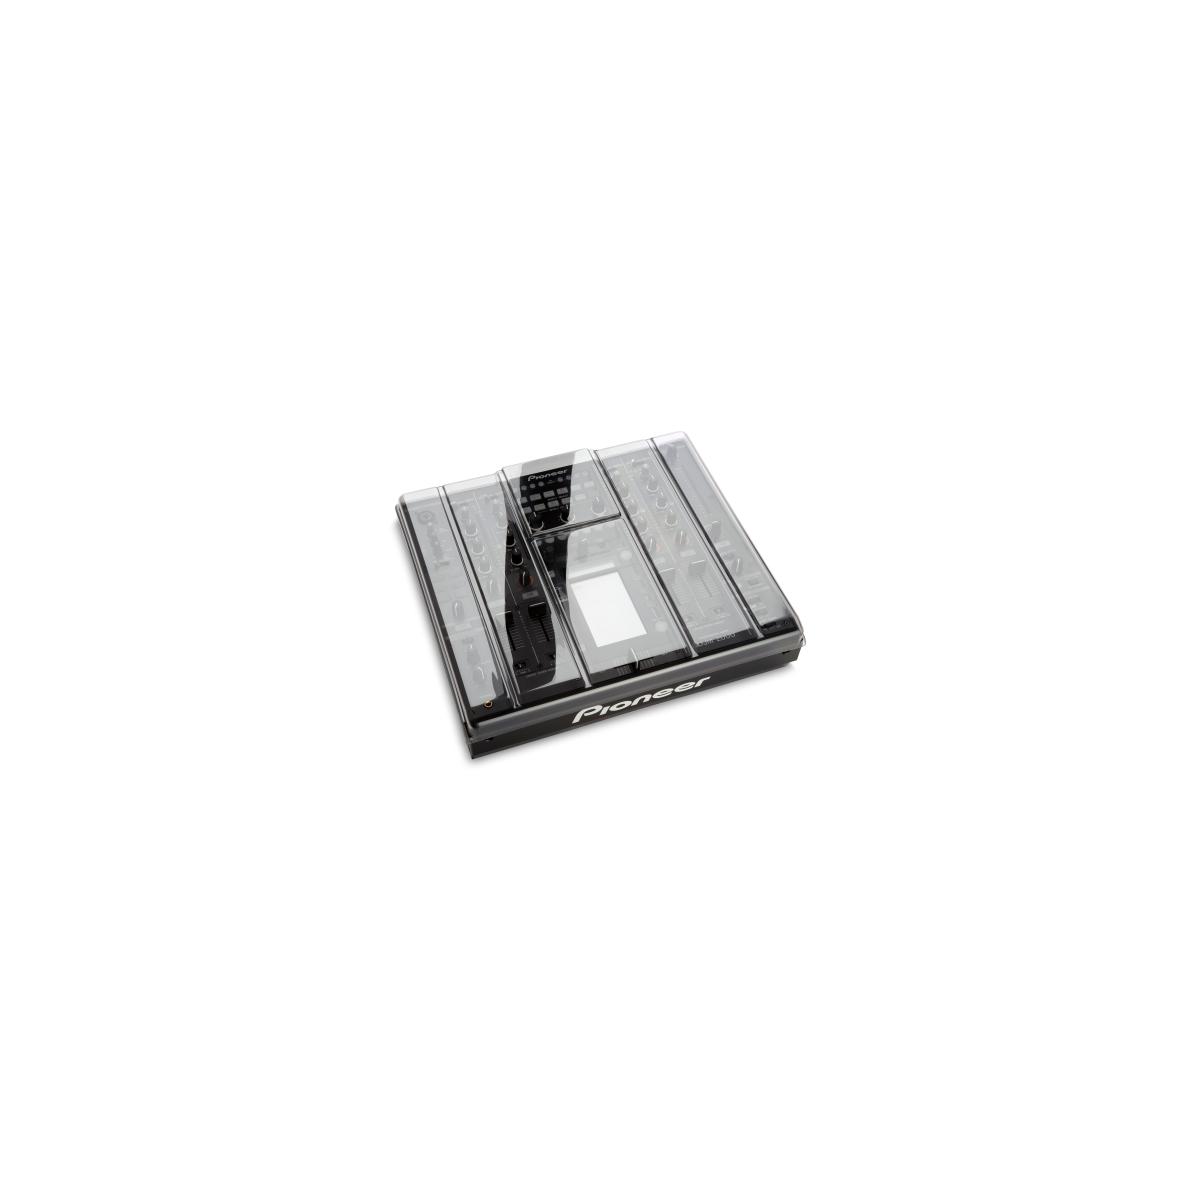 Decksavers - DeckSaver - DJM2000 TRANSPARENT